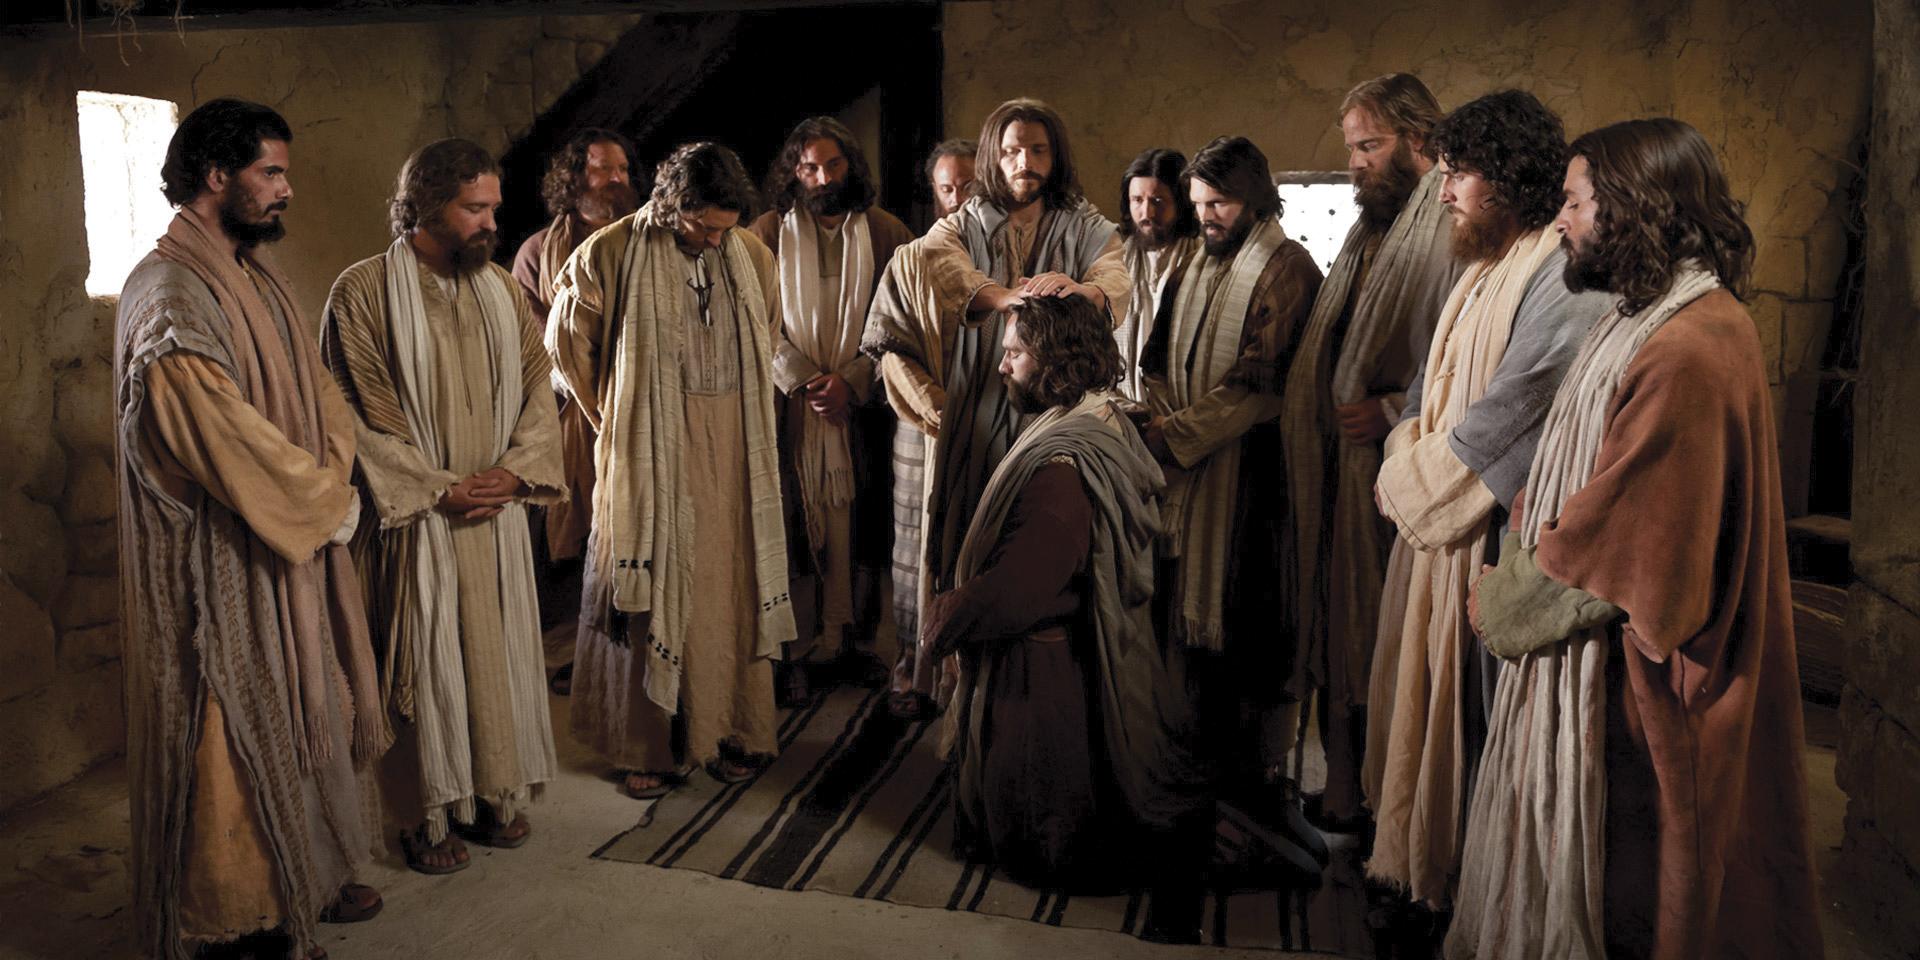 Christ ordaining the Apostle Peter.